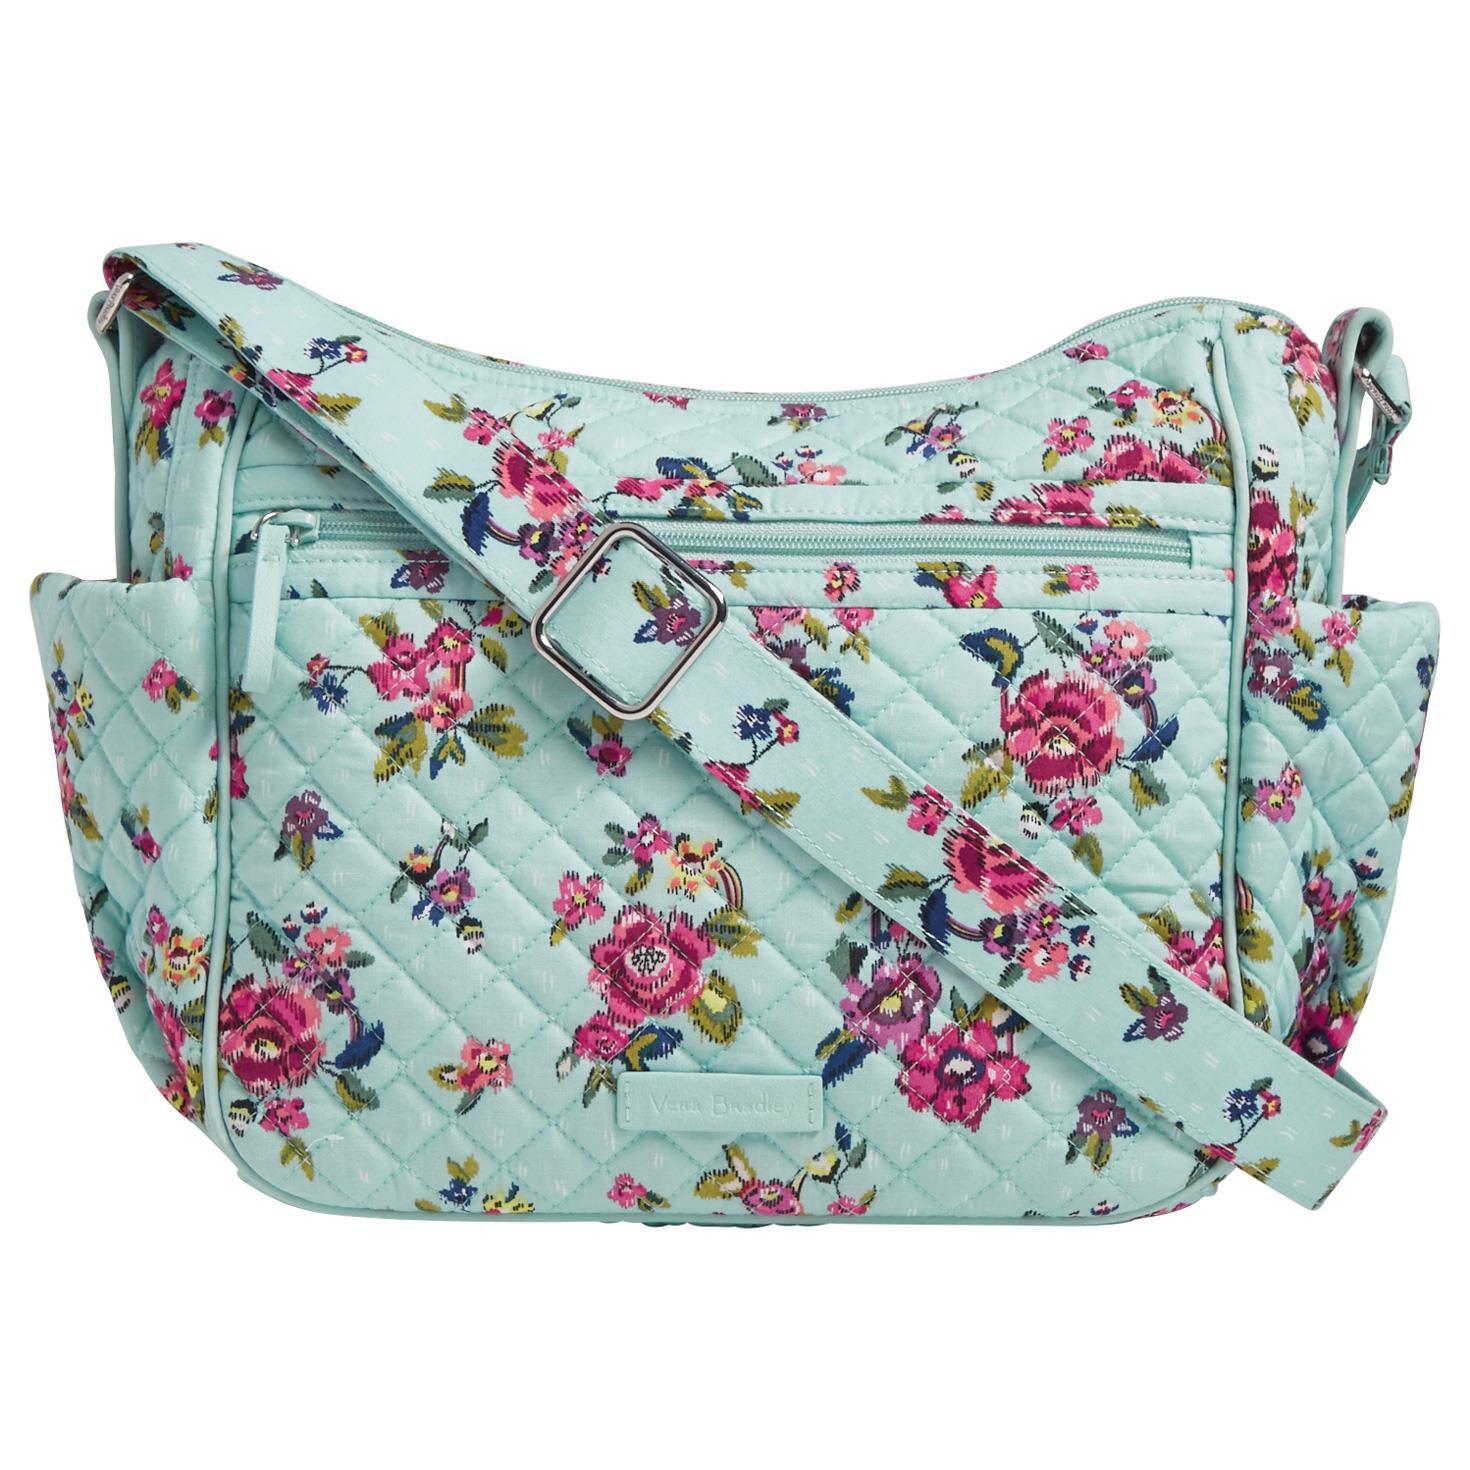 9784990ea3f8 Vera bradley iconic campus backpack in water bouquet handbags jpg 512x512 Hallmark  vera bradley